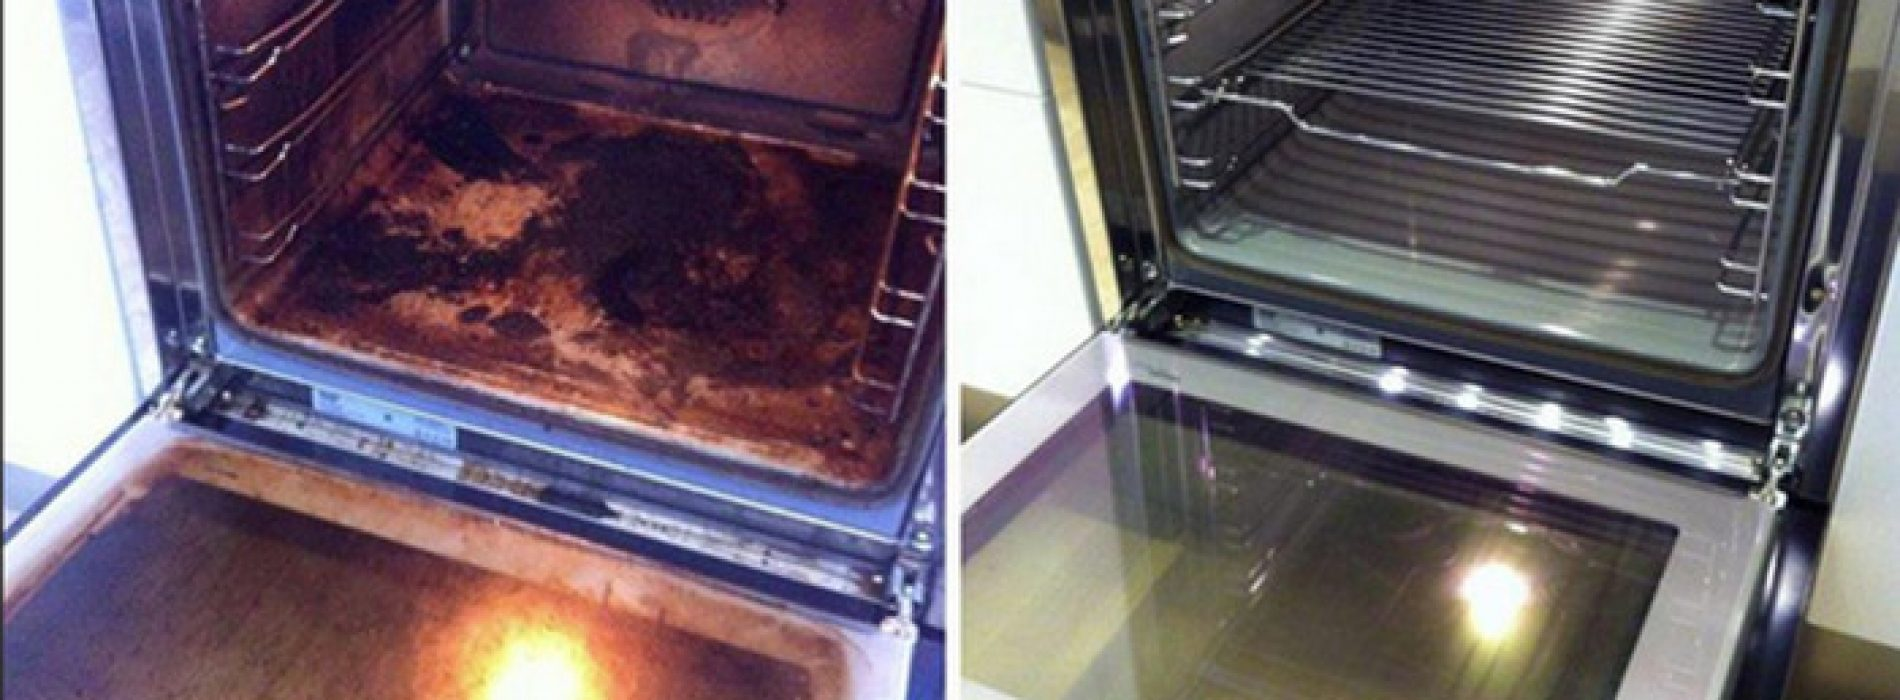 Met DIT middeltje maak jij je oven weer perfect schoon! DIT weet haast niemand!